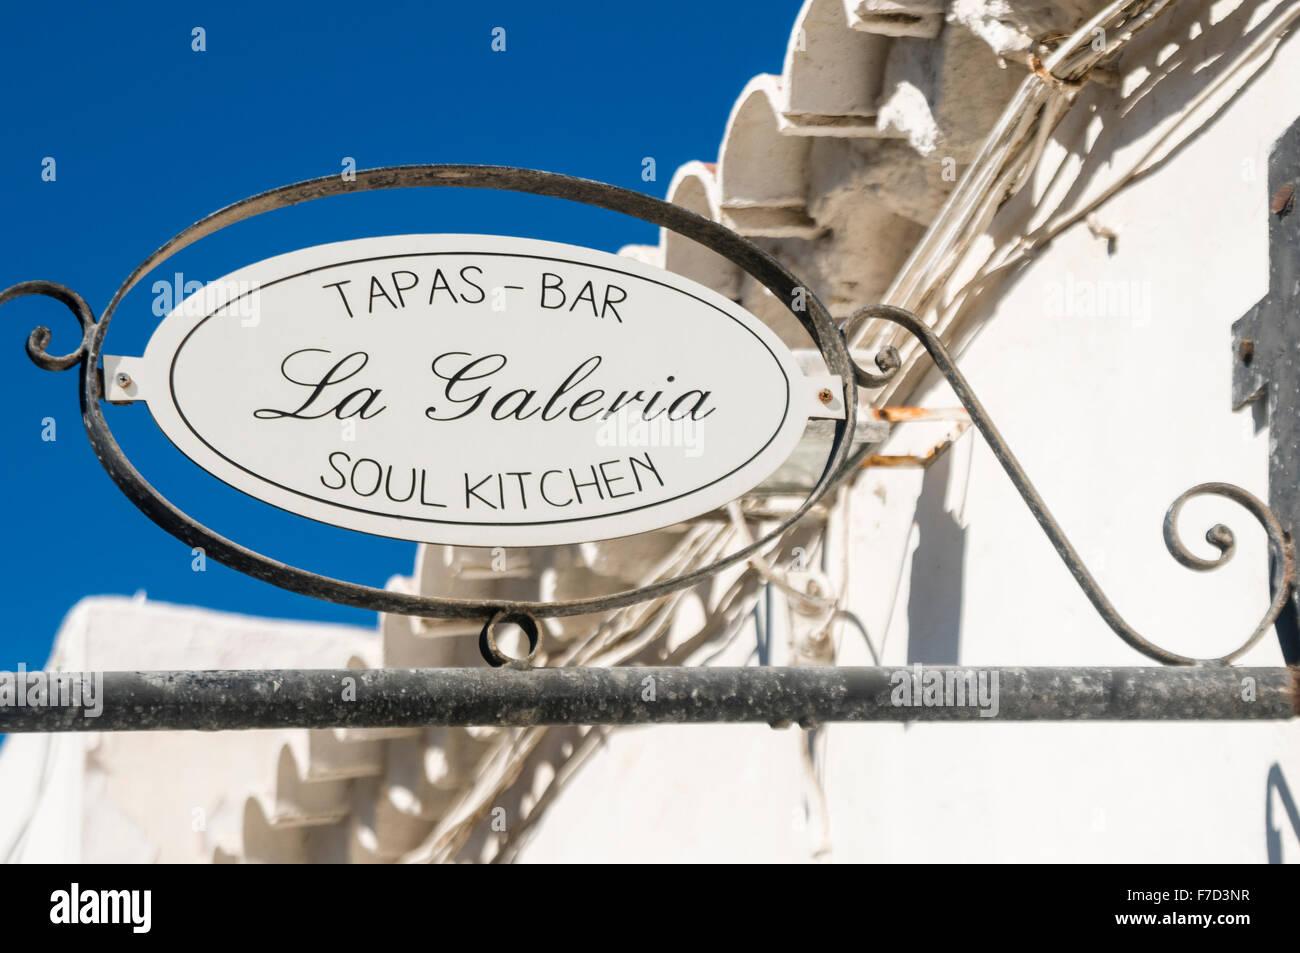 Soul Cafe Stock Photos & Soul Cafe Stock Images - Alamy